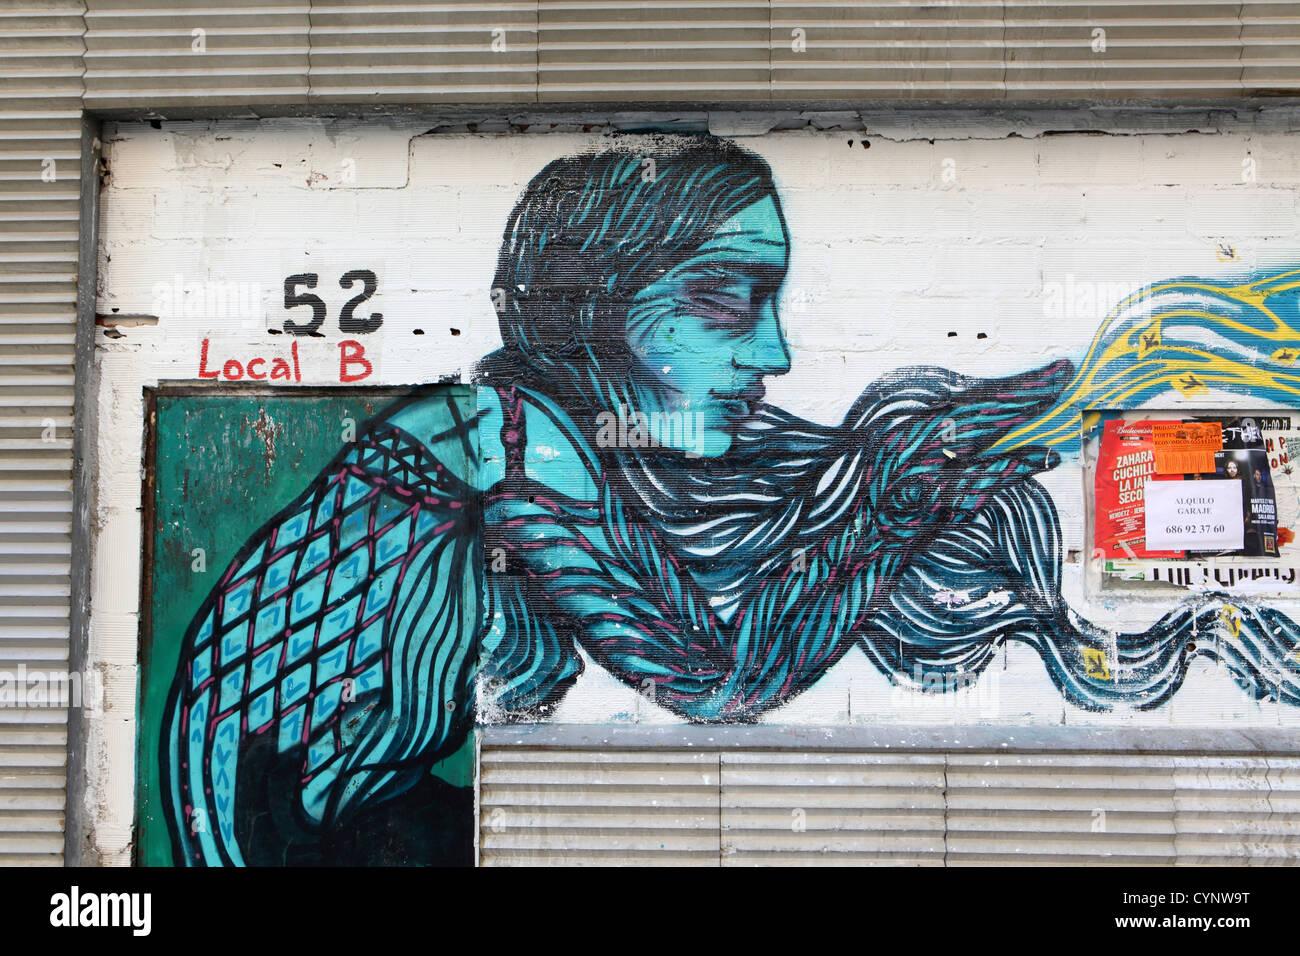 Graffiti wall painting - Street Art Graffiti Wall Painting Of Woman With Long Hair Self Expression Madrid Spain Espana